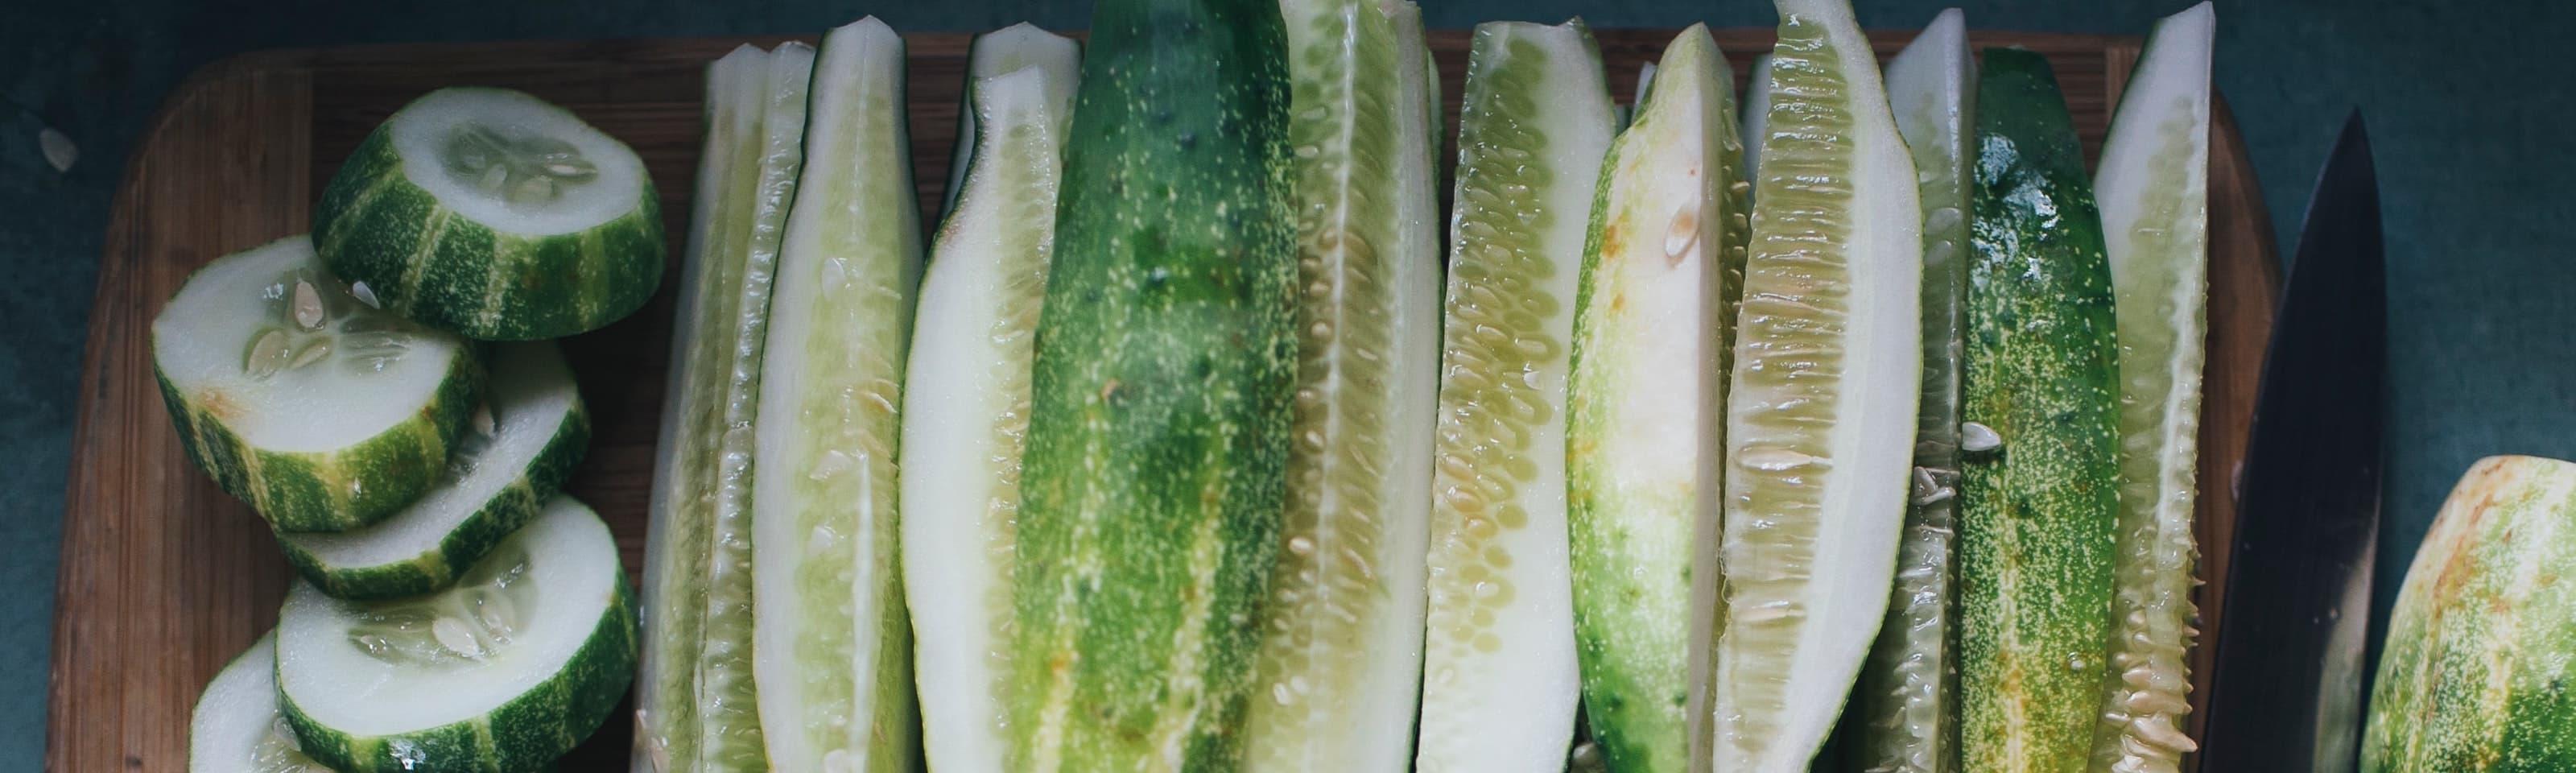 Photo of sliced cucumbers.